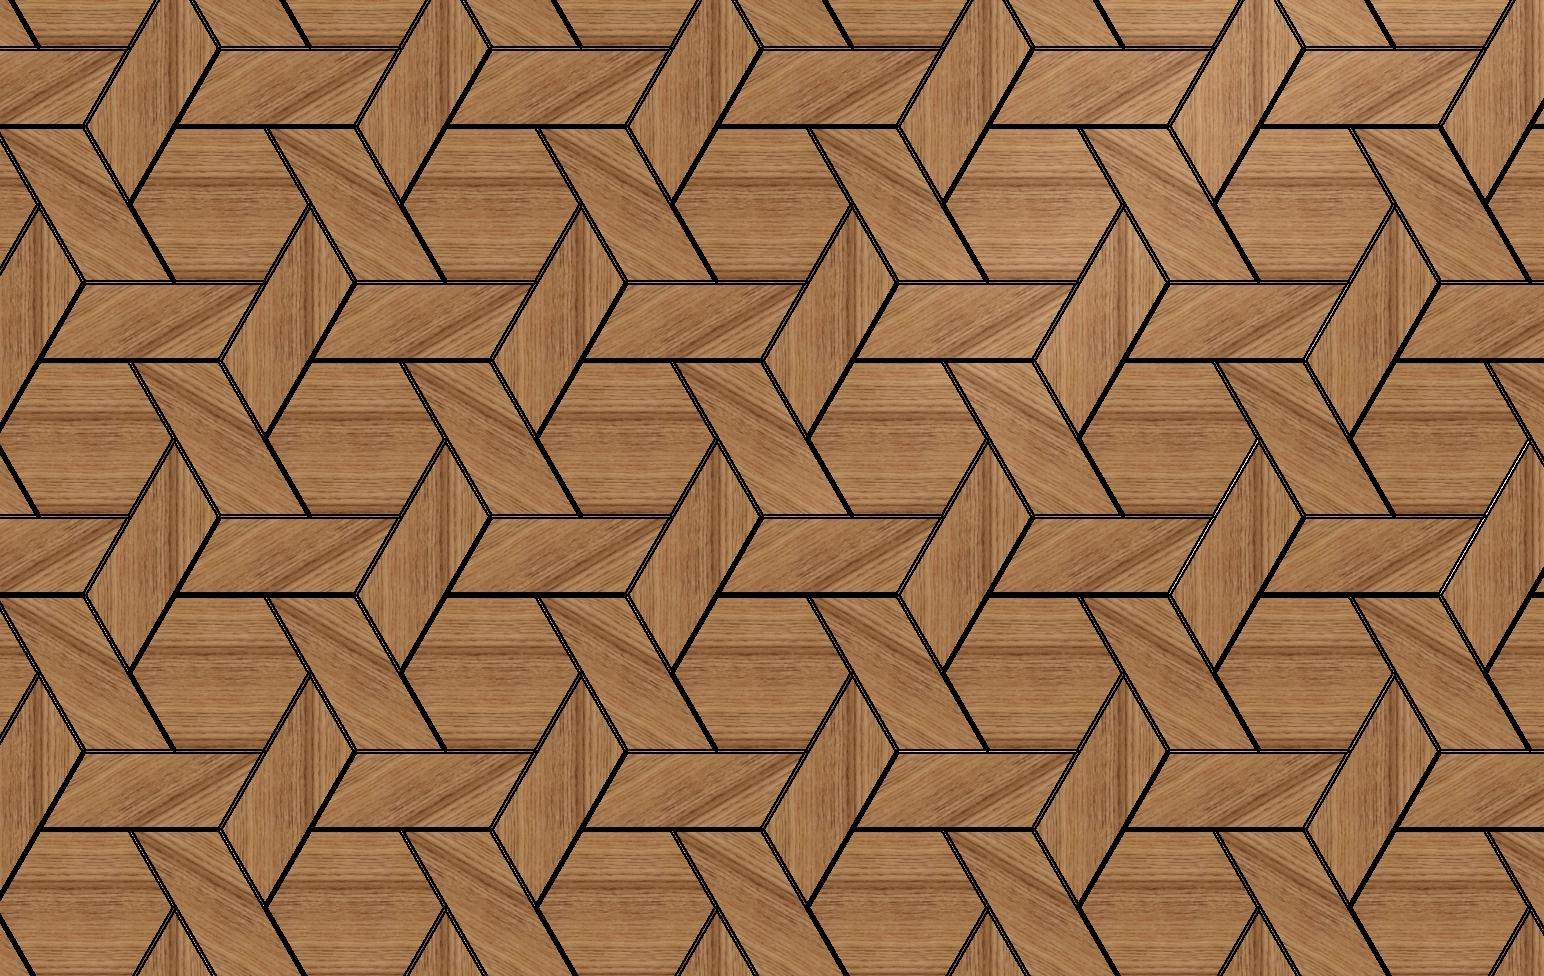 Parquet Patterns Exotic Hardwood Flooring Lumber